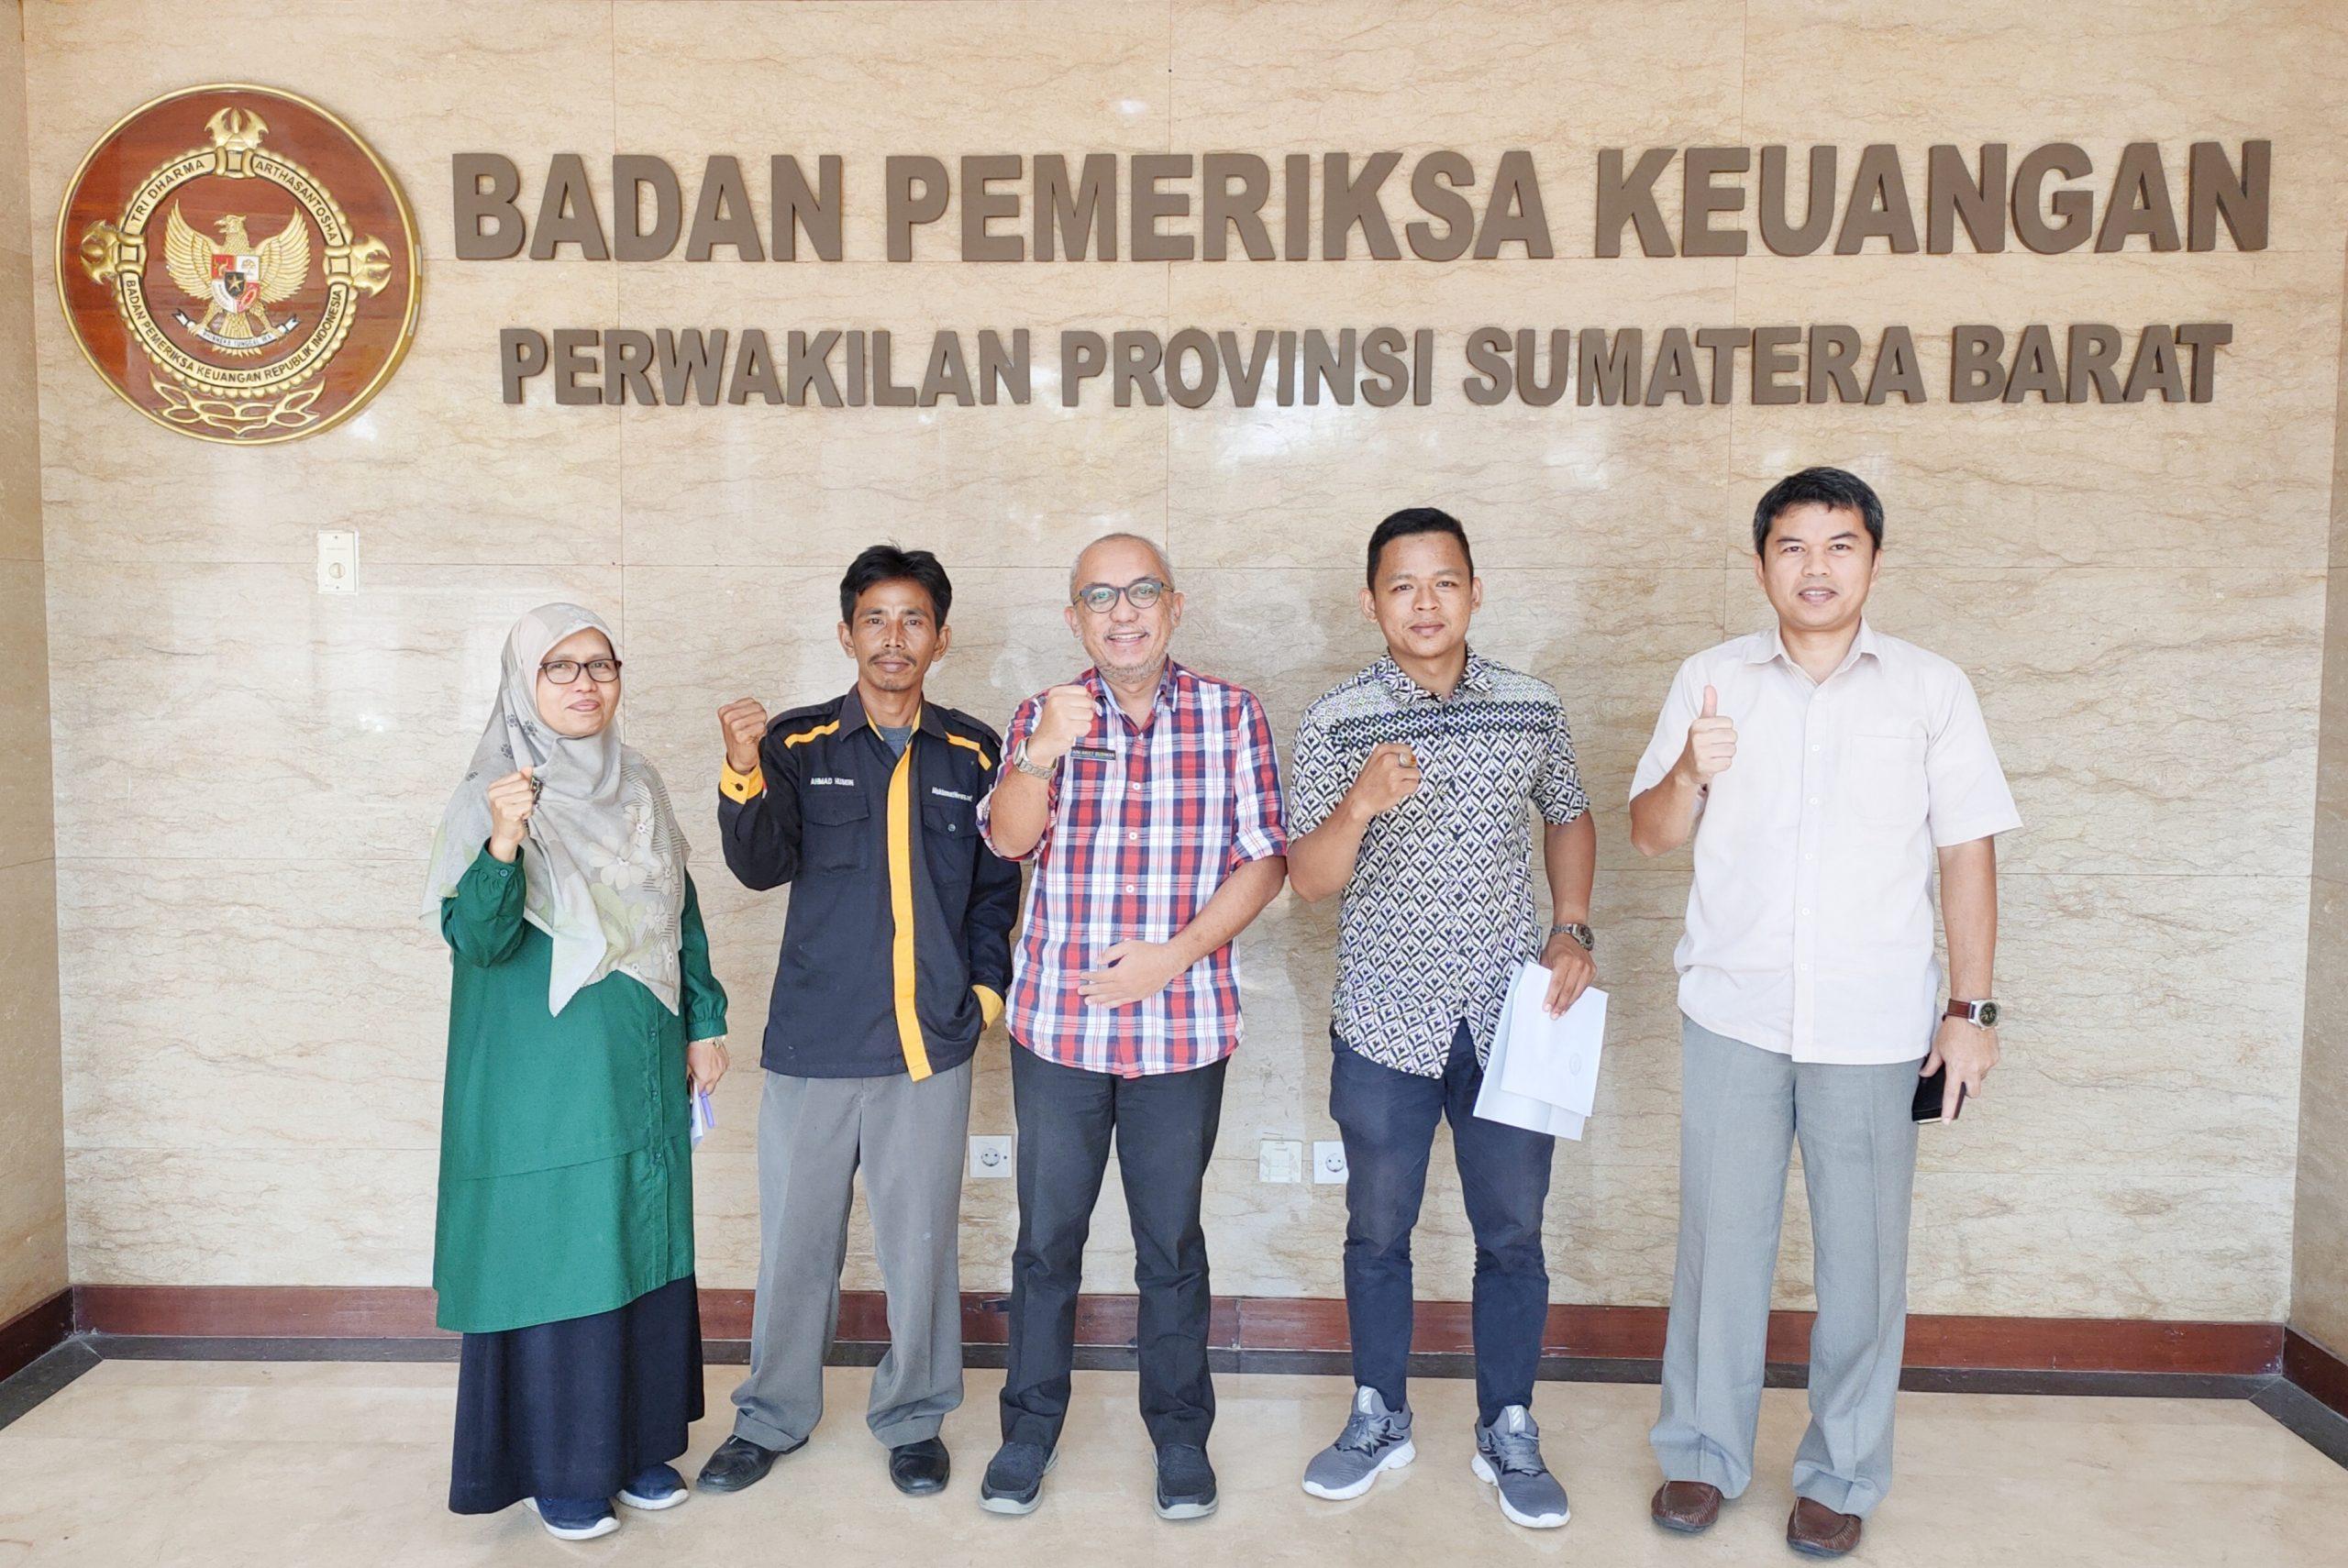 Foto bersama wartawan Deliknews Darlin dan LSM Fopbindo Husein dengan jajaran para pimpinan BPK Perwakilan Sumbar.